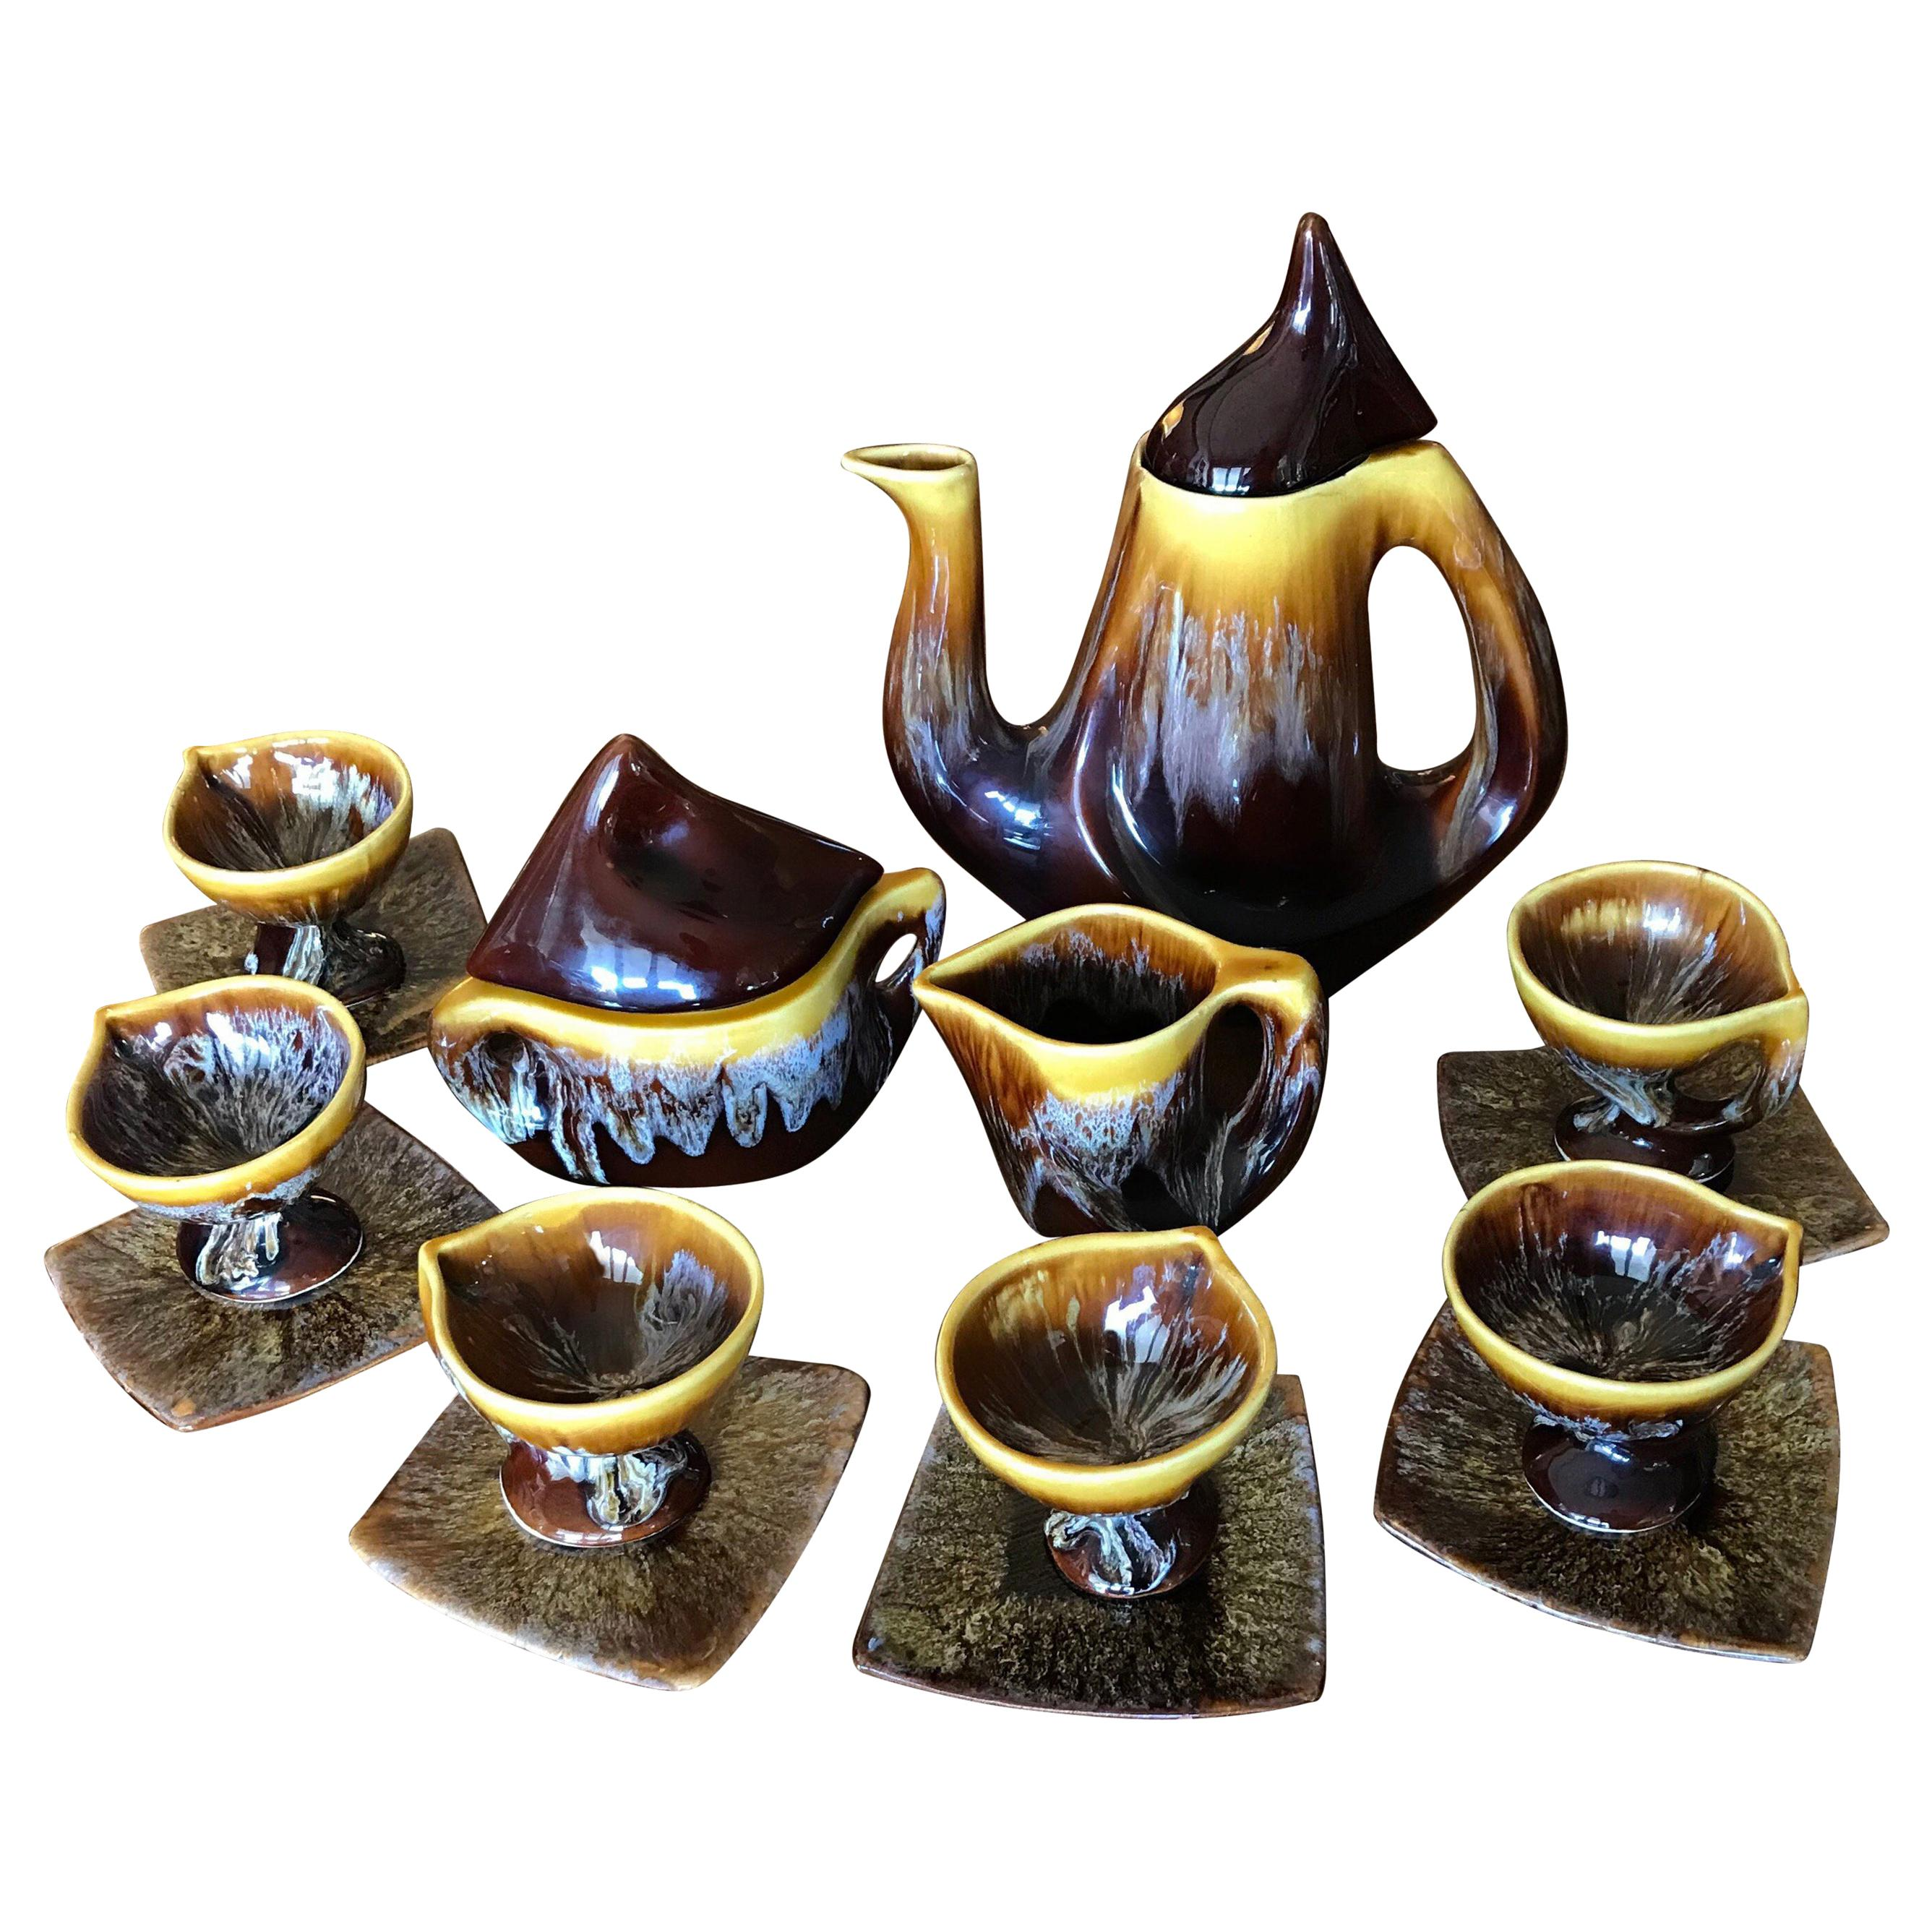 Vallauris Coffee Set Yellow Brown Ceramic, Mid-Century Modern, France, 1950